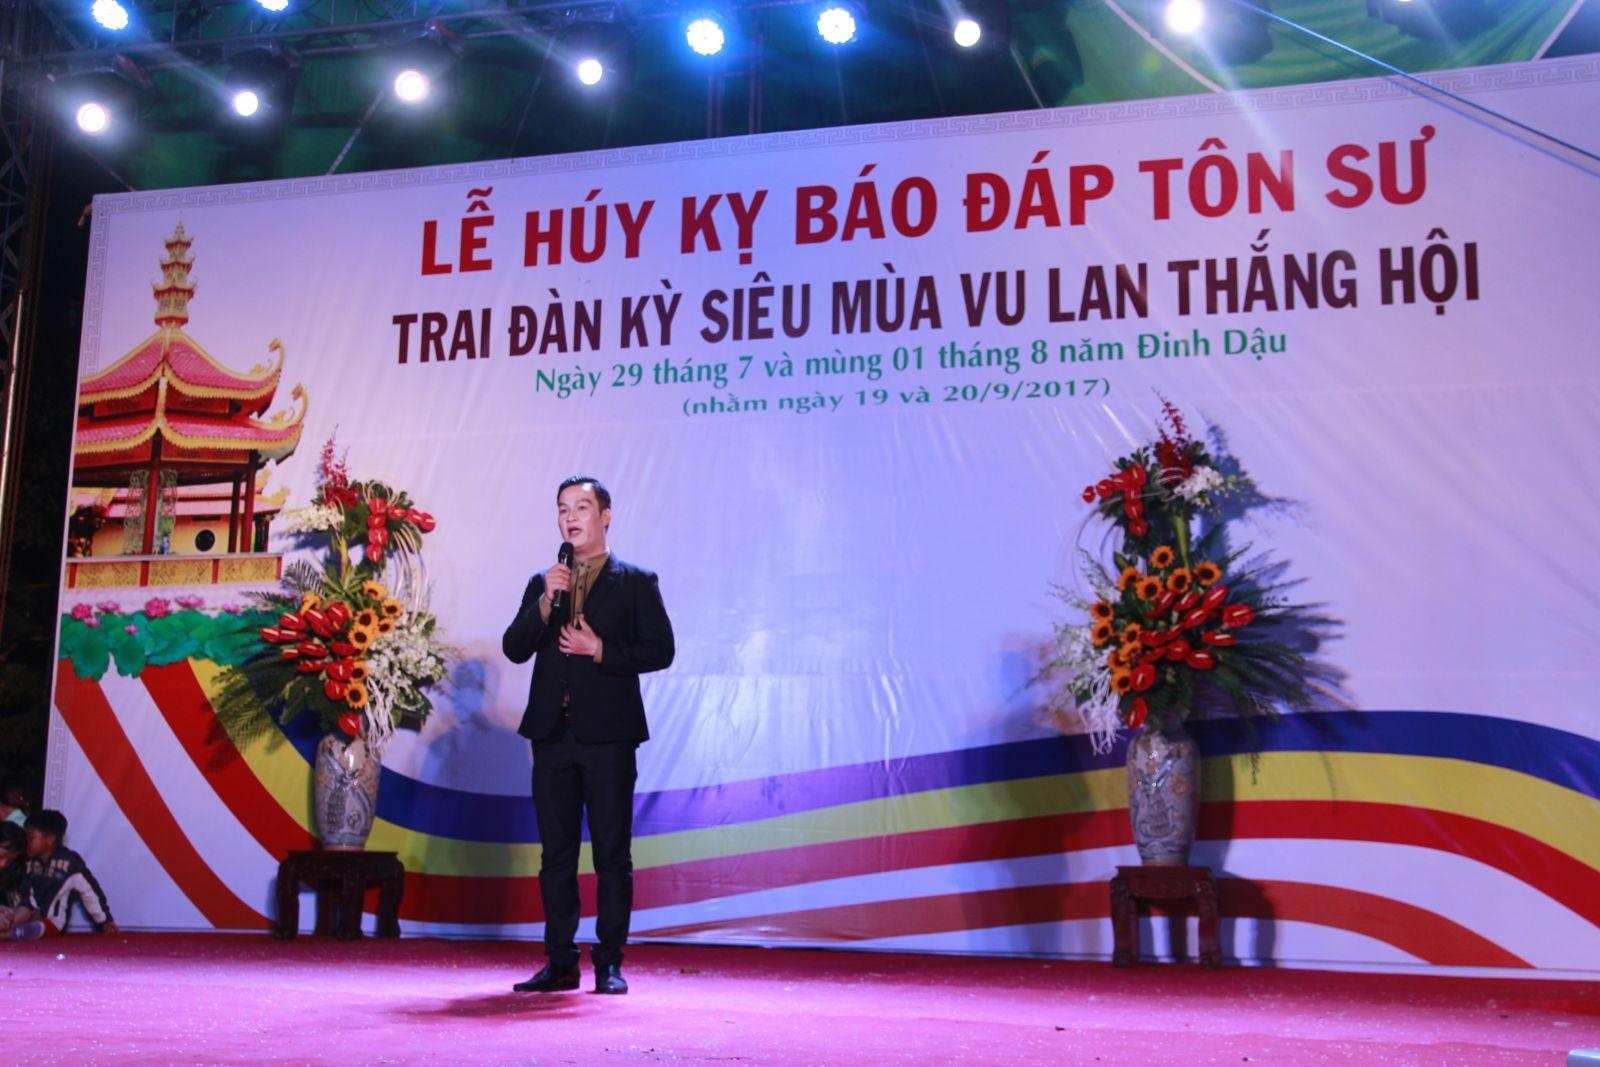 Ca sĩ Anh Tuấn